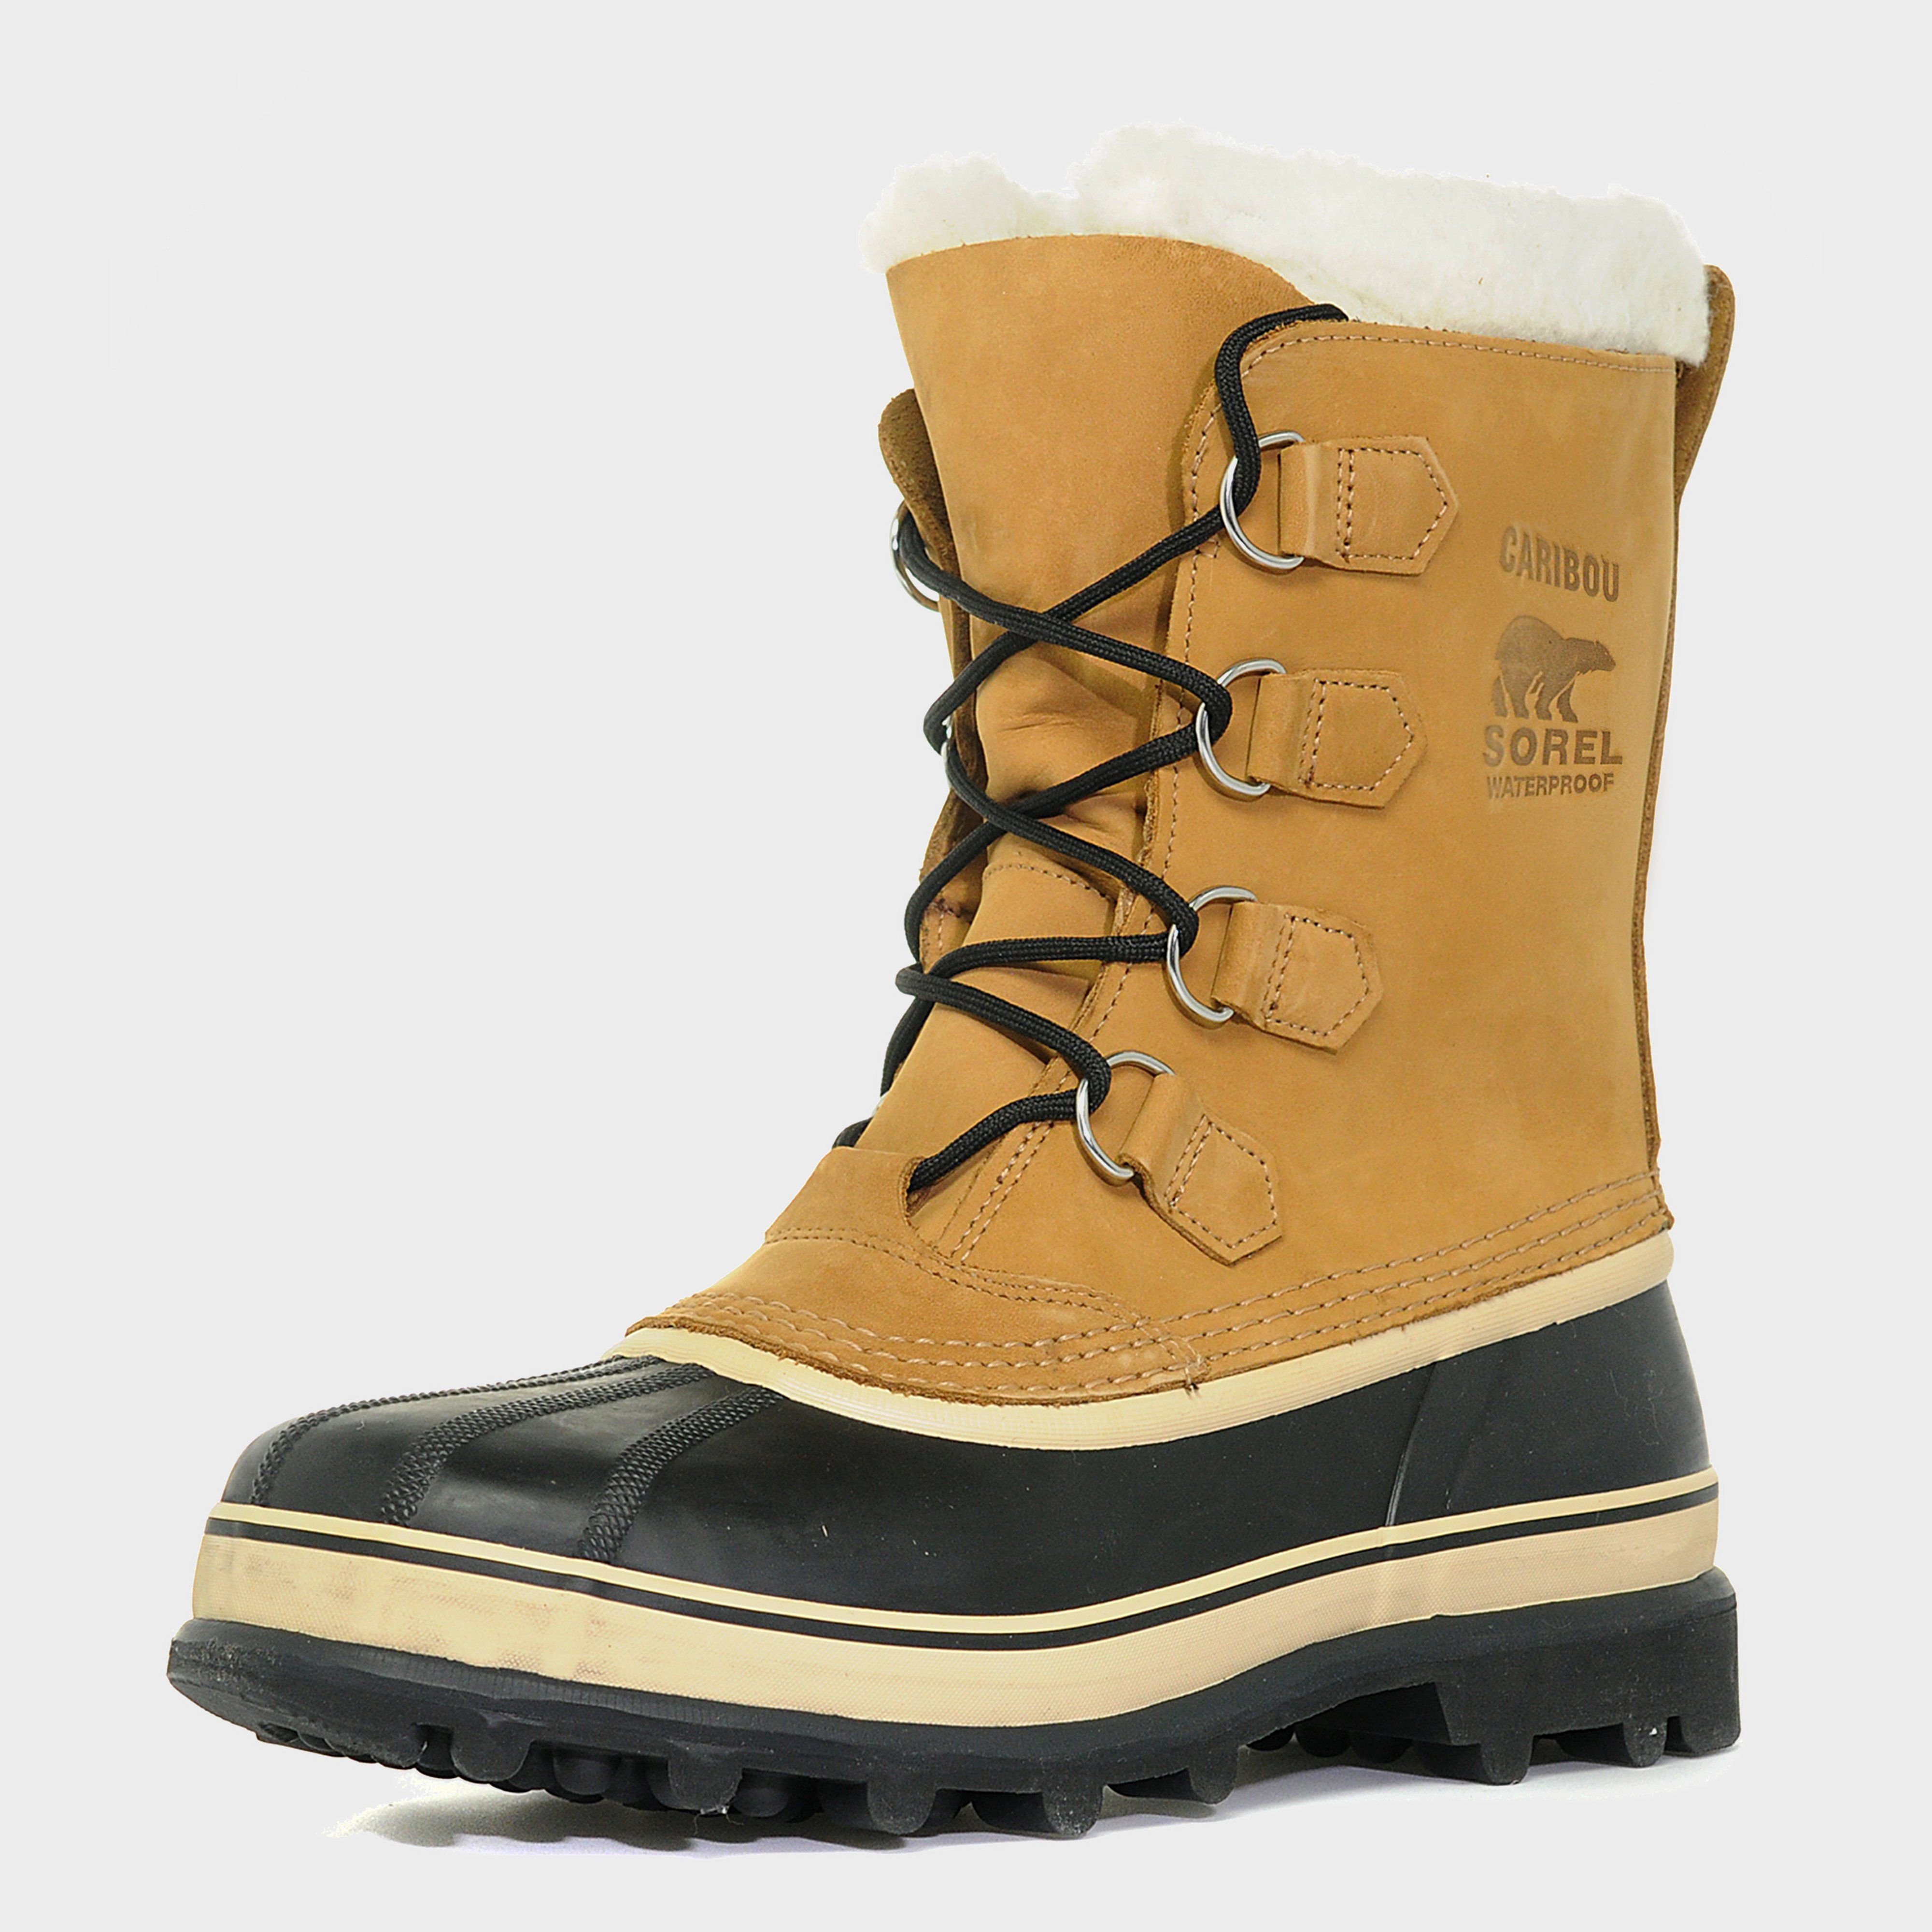 SOREL Men's Caribou Snow Boot